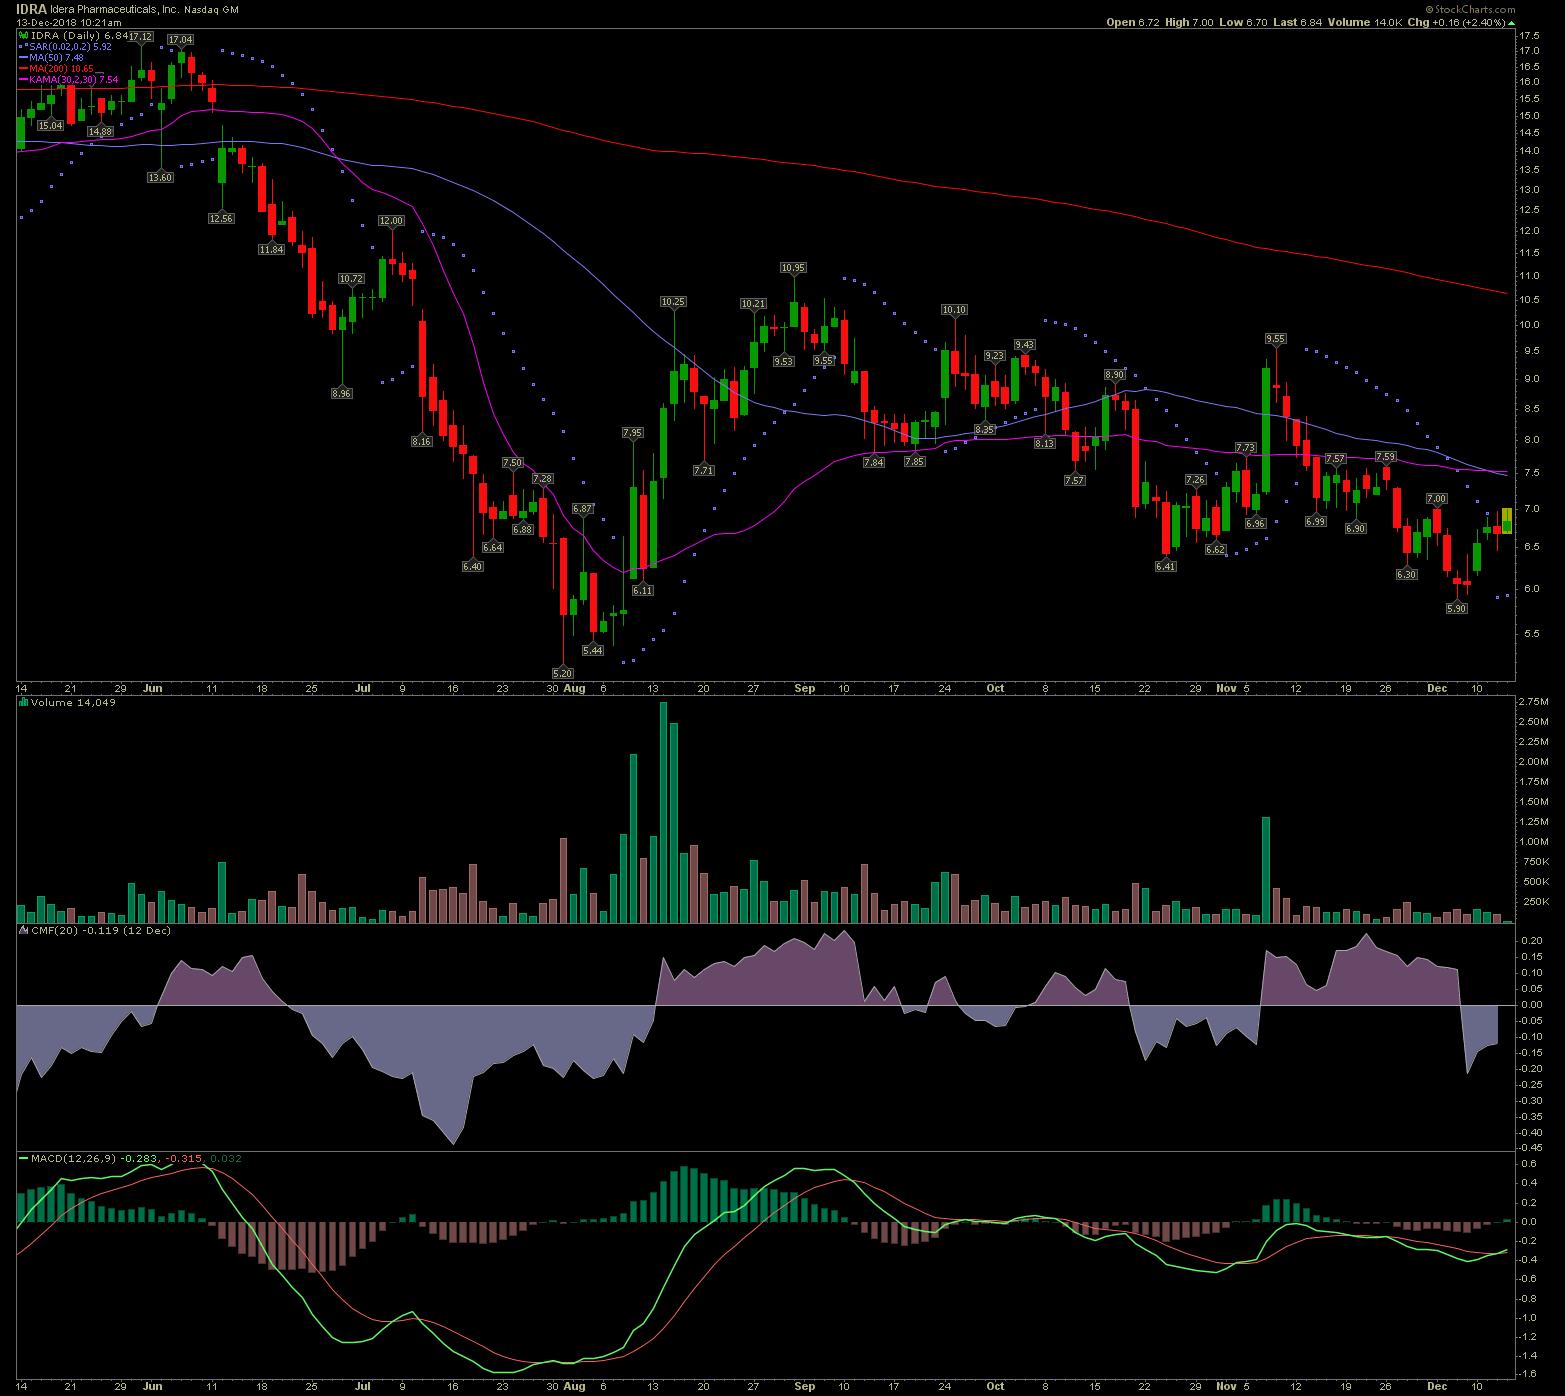 IDRA stock